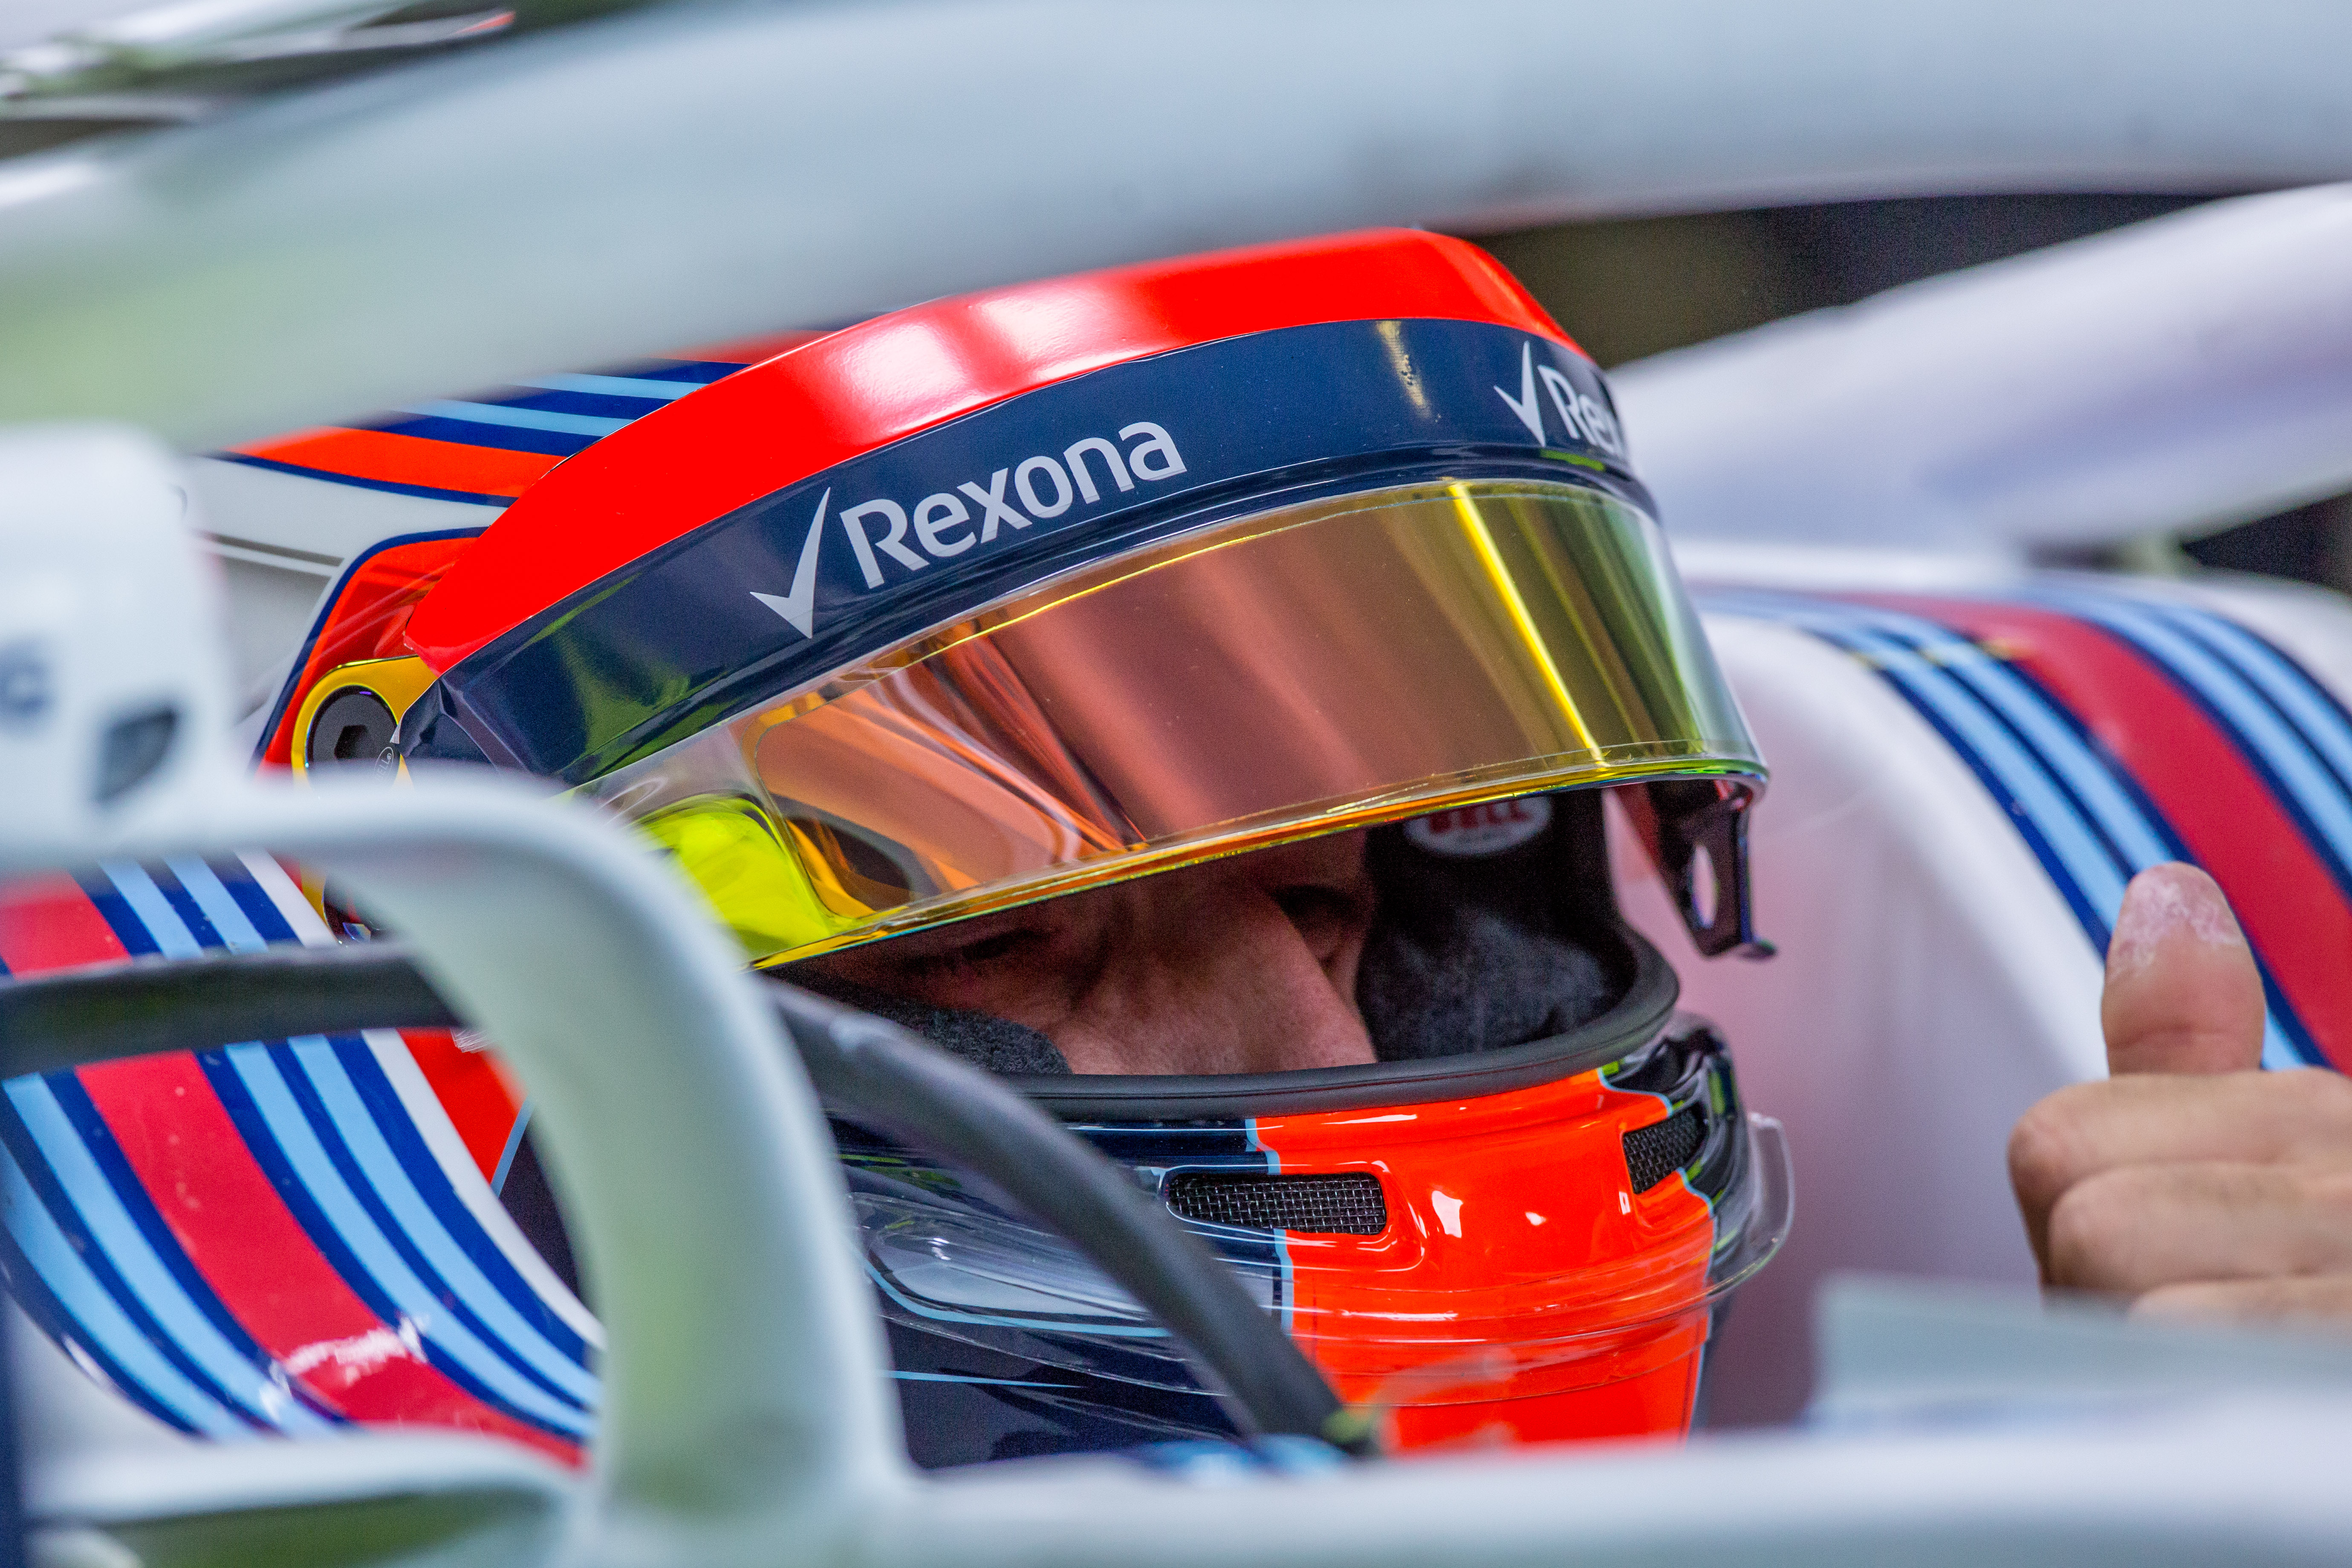 2018.08.01, Budapeszt, Formula 1, Hungaroring  N/z Robert Kubica, Foto: Pawel Jaskolka / PressFocus